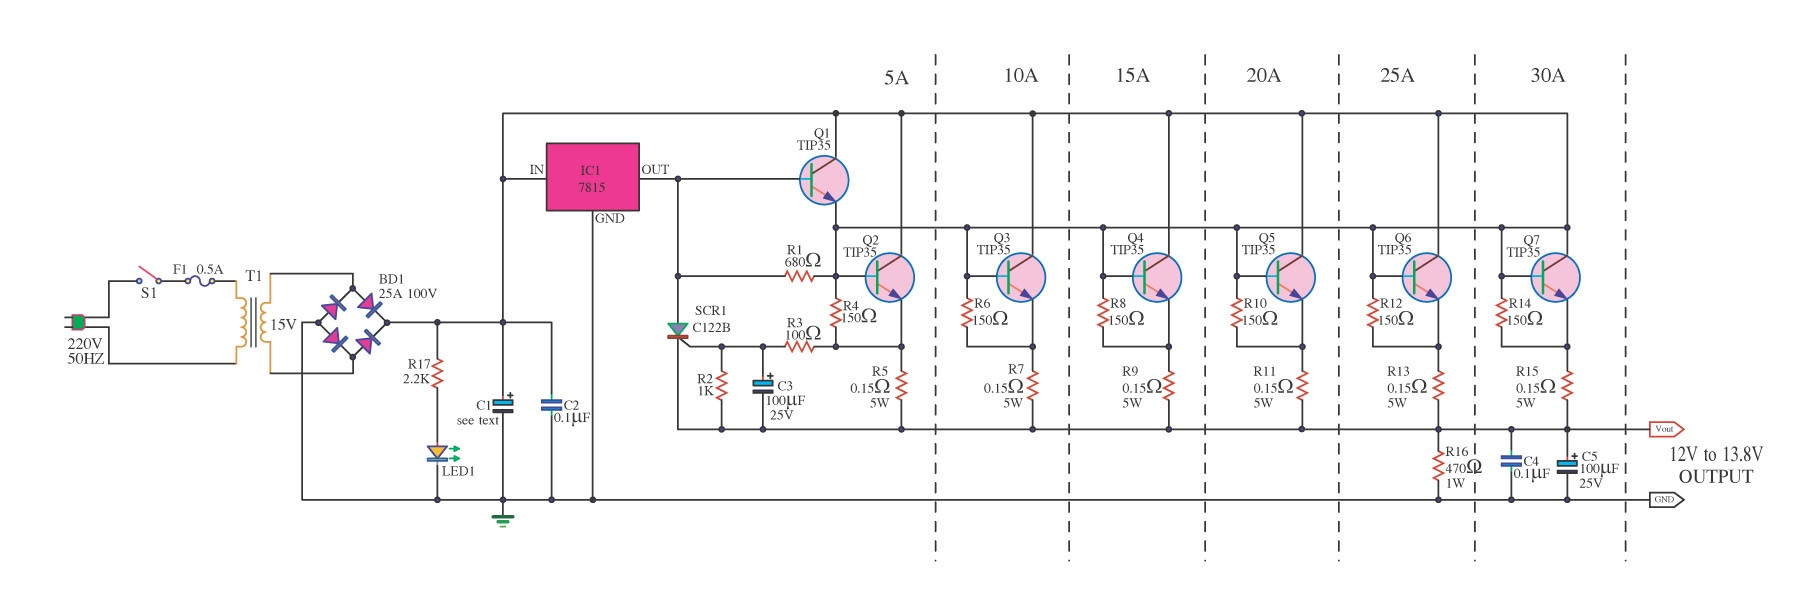 high-current-12v-30a-25a-20a-15a-power-supply